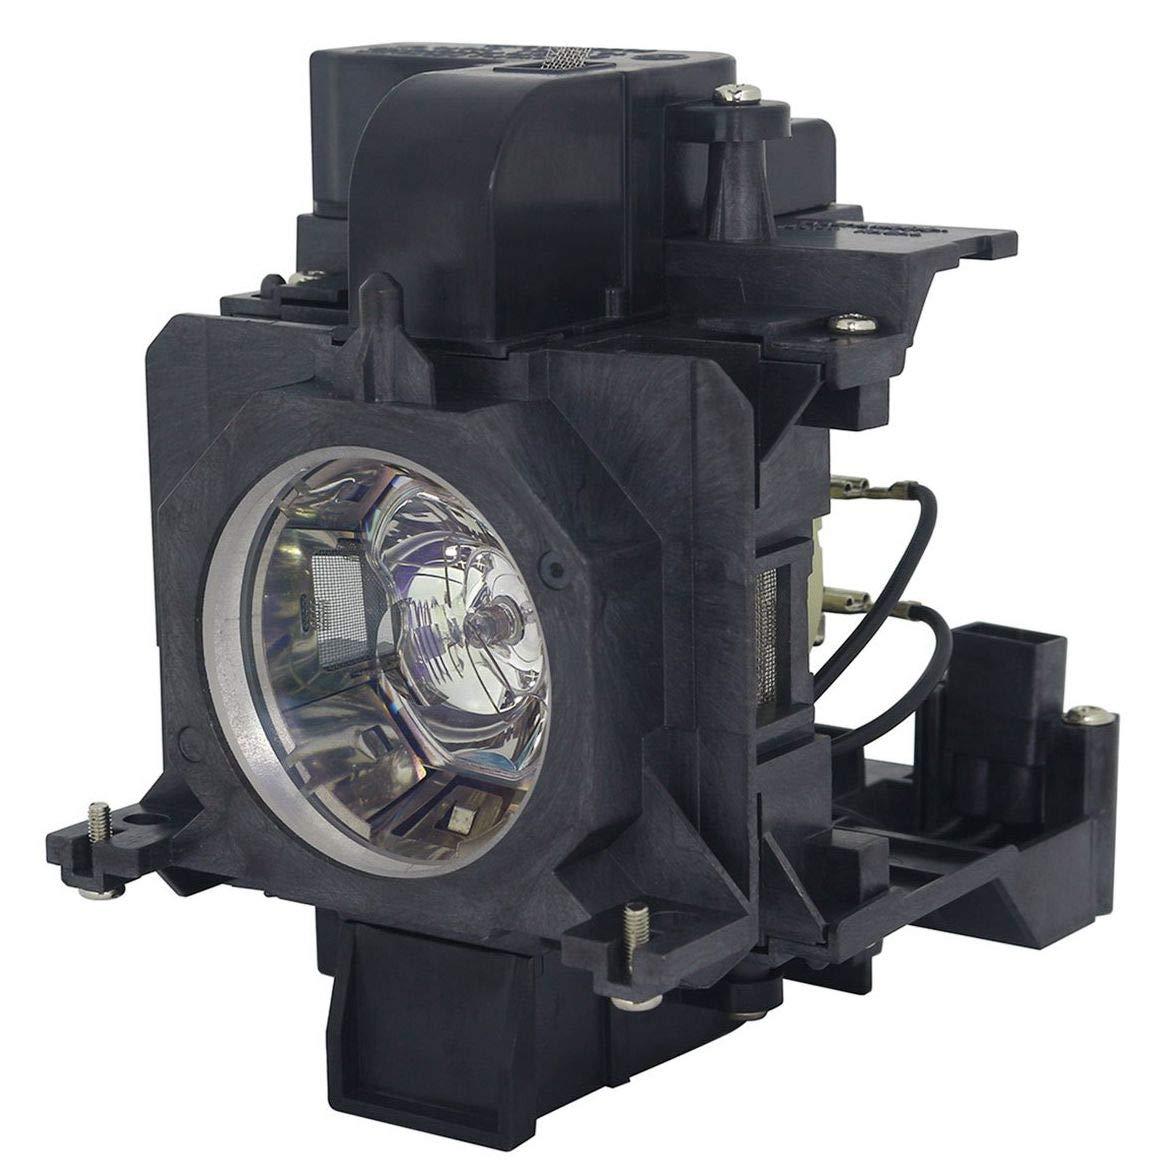 ET-LAE200 Проектор Лампа для проектора Панасоник PT-EW530E PT-EW630E PT-EW630EL PT-EX500E PT-EZ570EL PT-EW530 PT-EX600 PT-EX500 PT-EX600